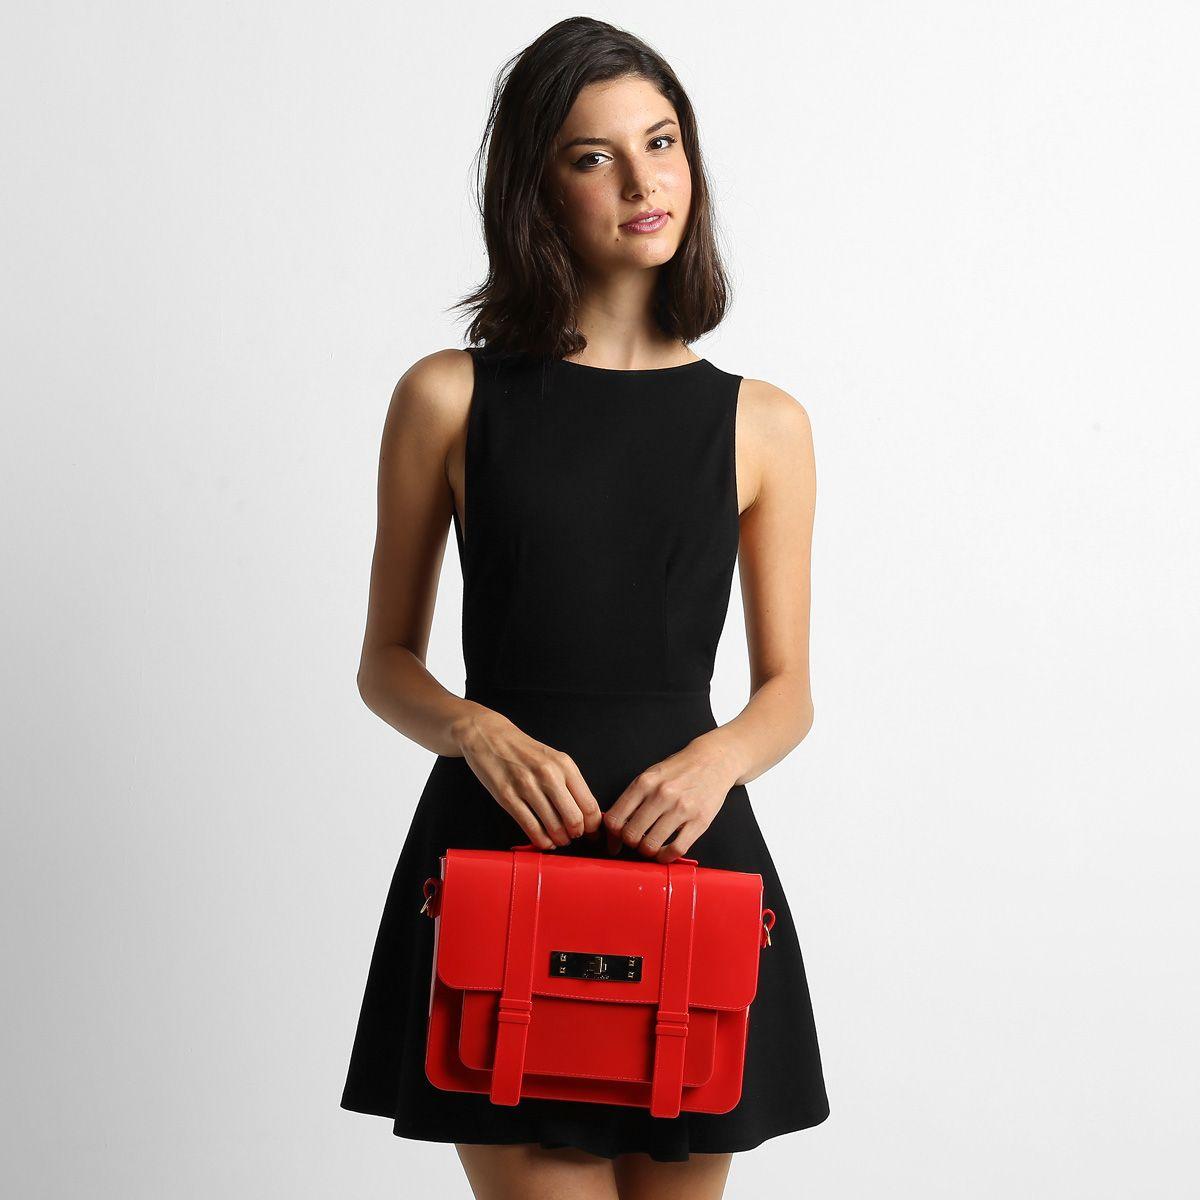 Bolsa Petite Jolie Média Transversal Azul | Zattini - A nova loja de moda online da Netshoes